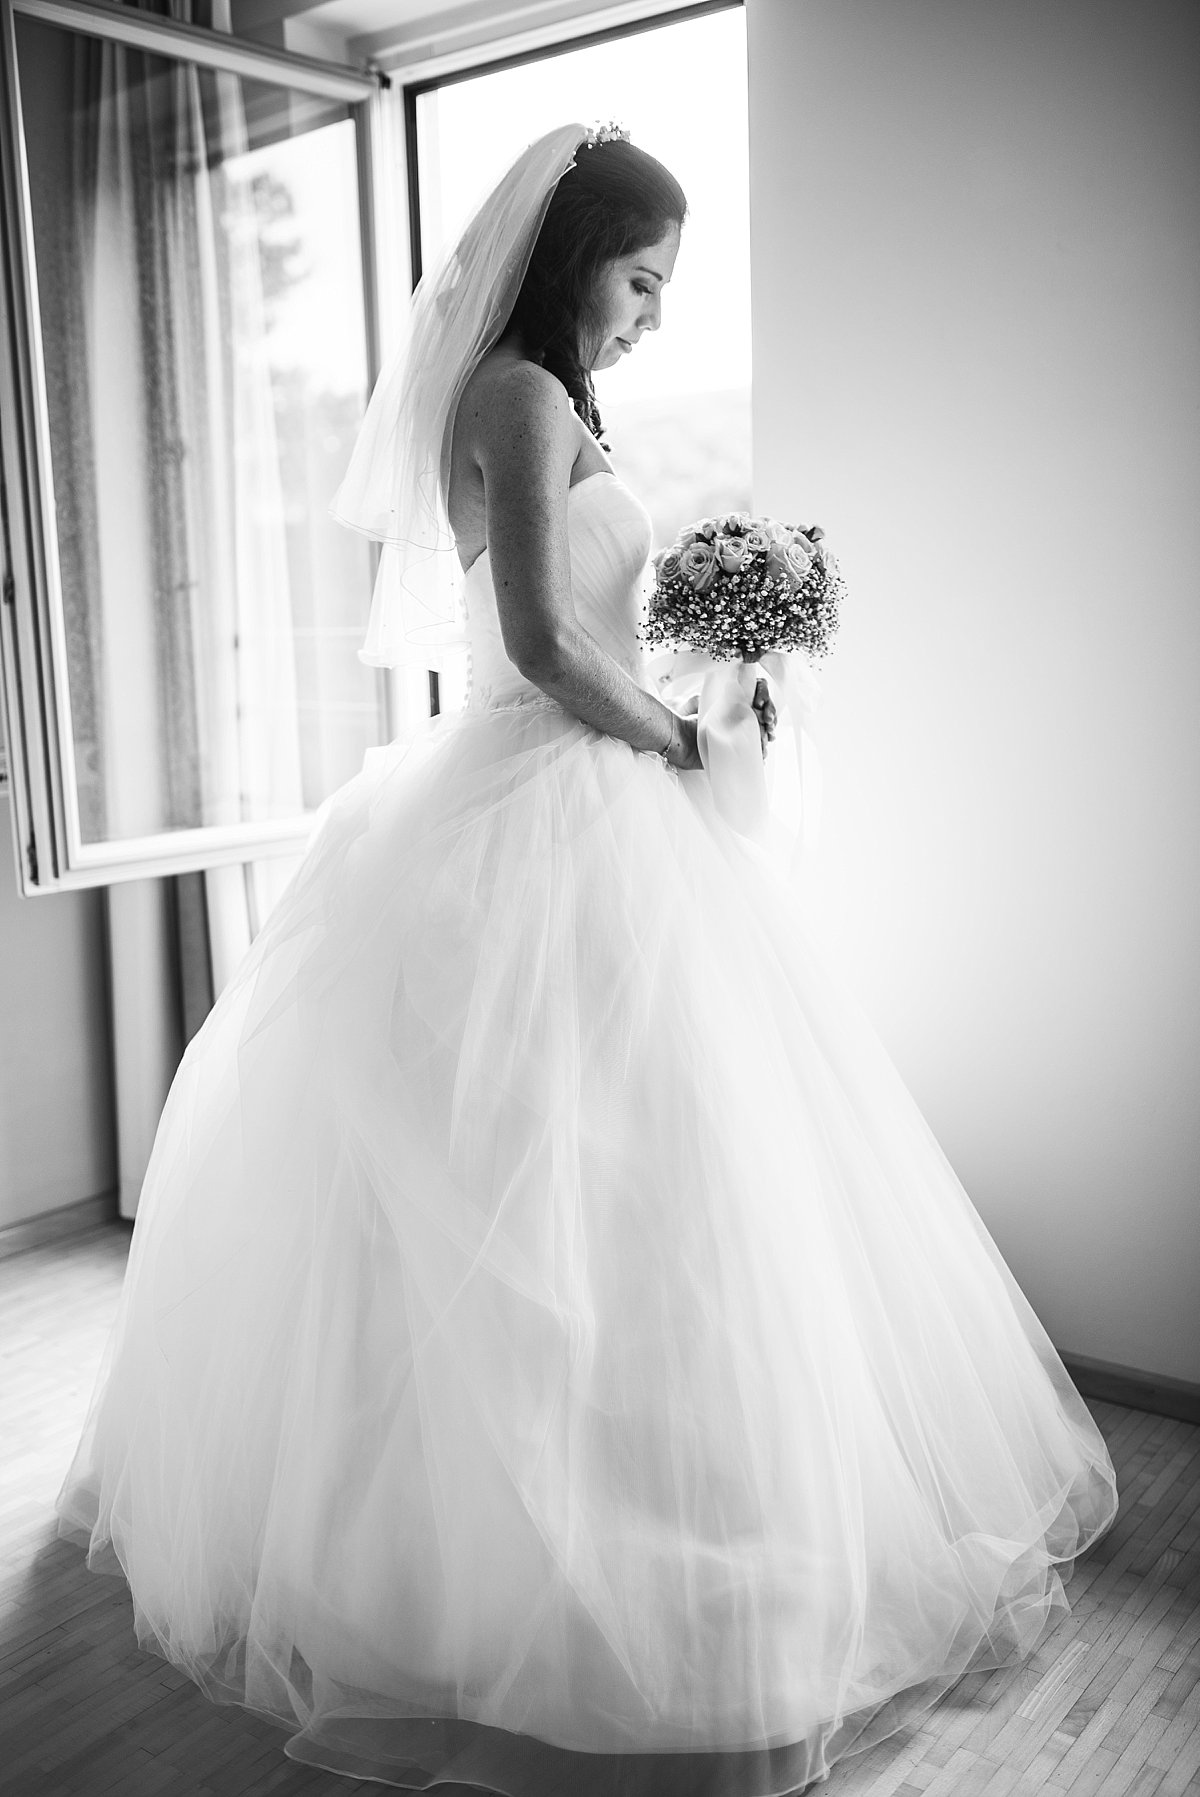 daniel-lopez-perez-wedding-photographer-austria-033